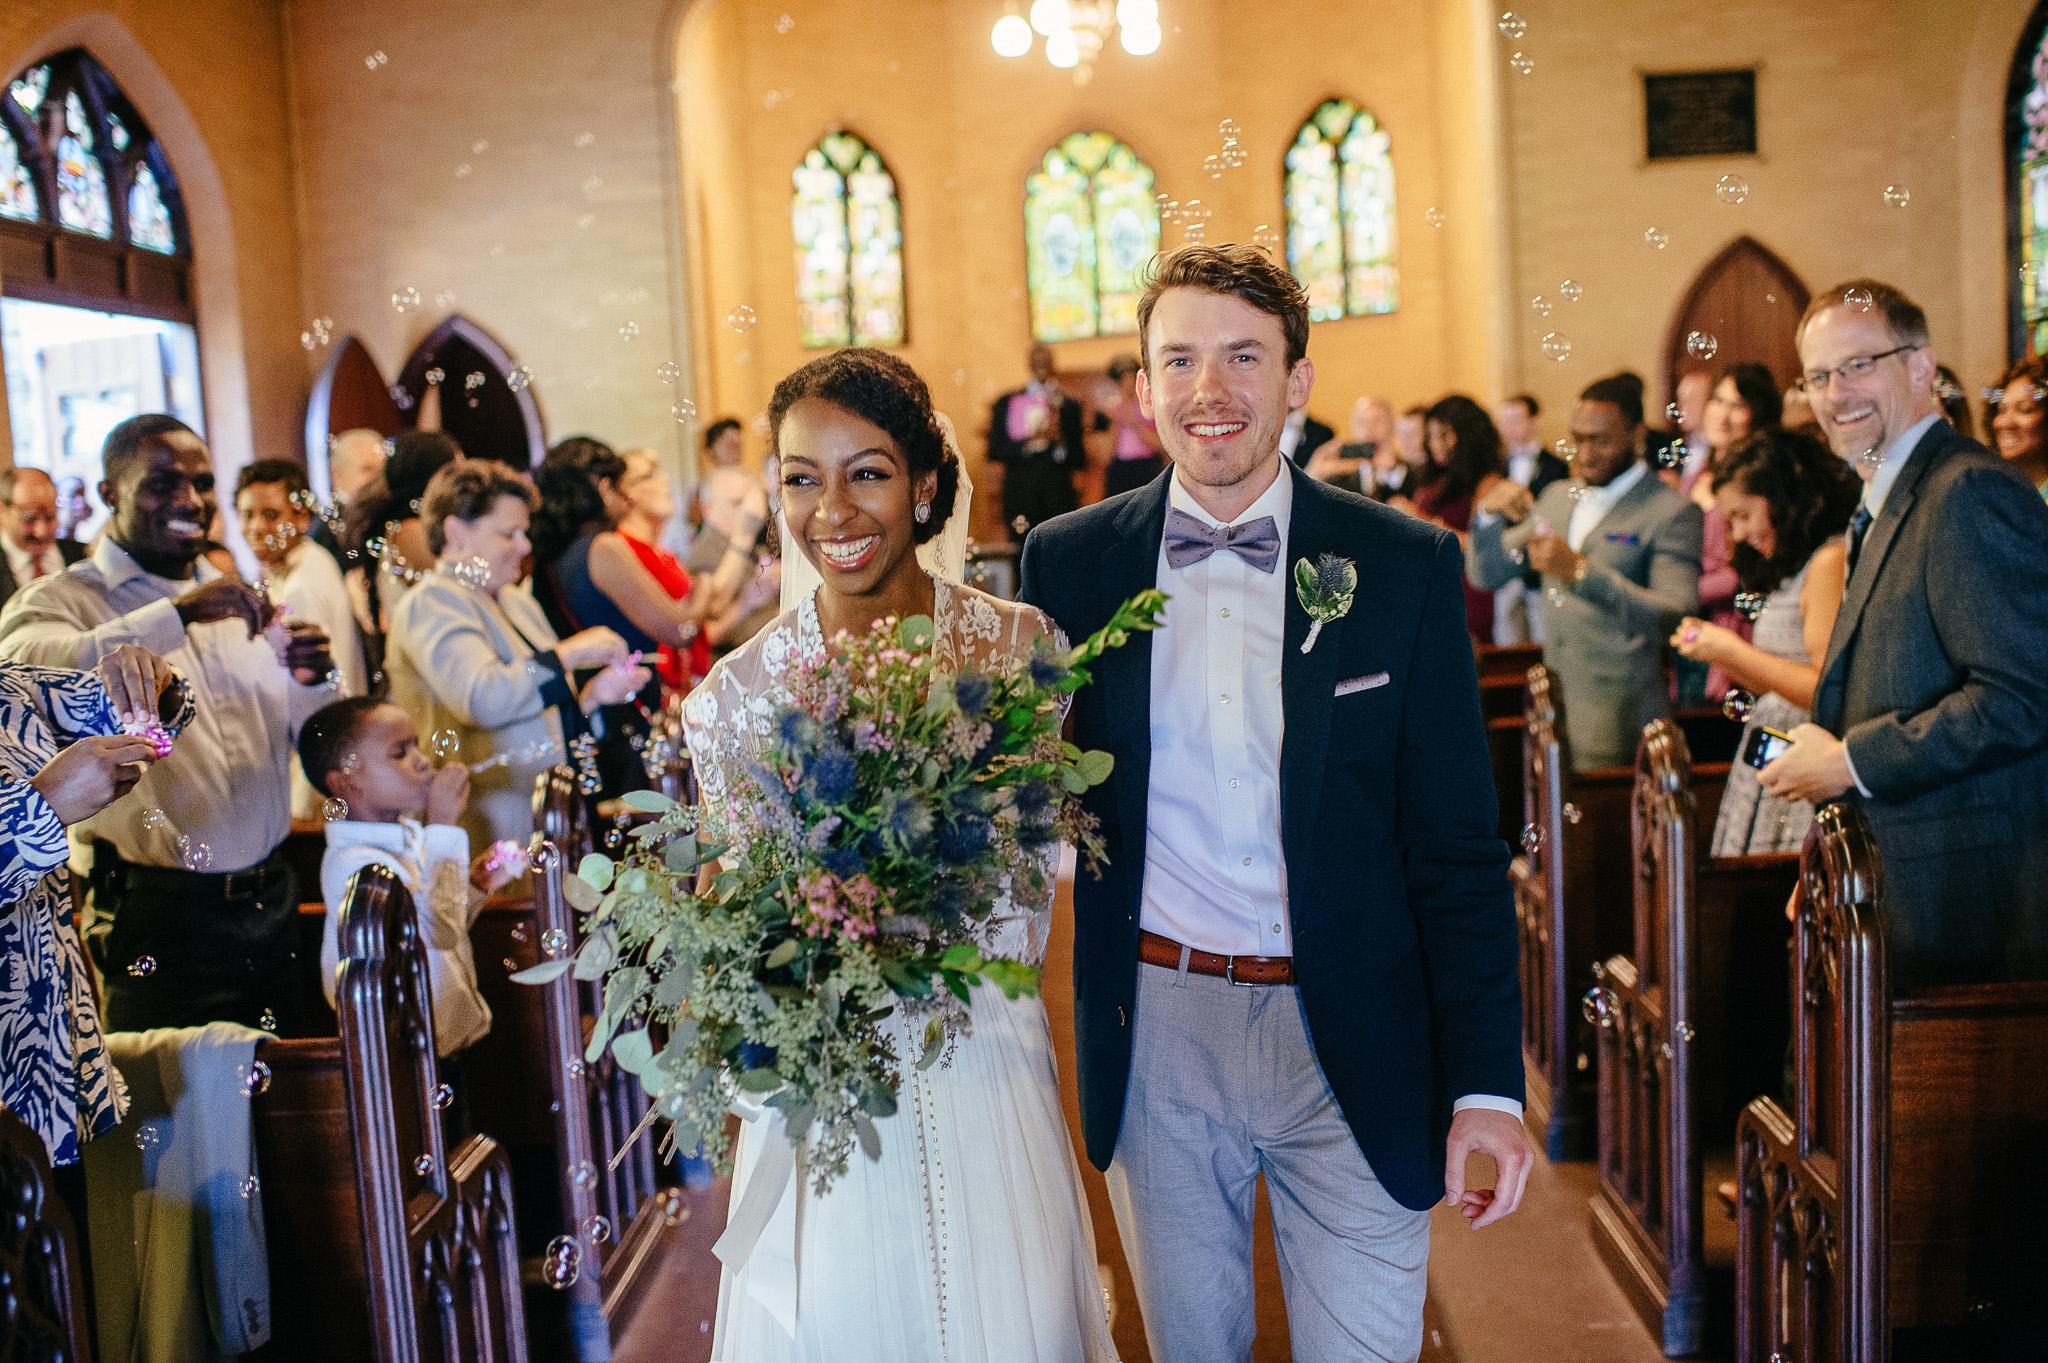 Wilde Chapel Portland Maine Wedding, bubbles during wedding recessional